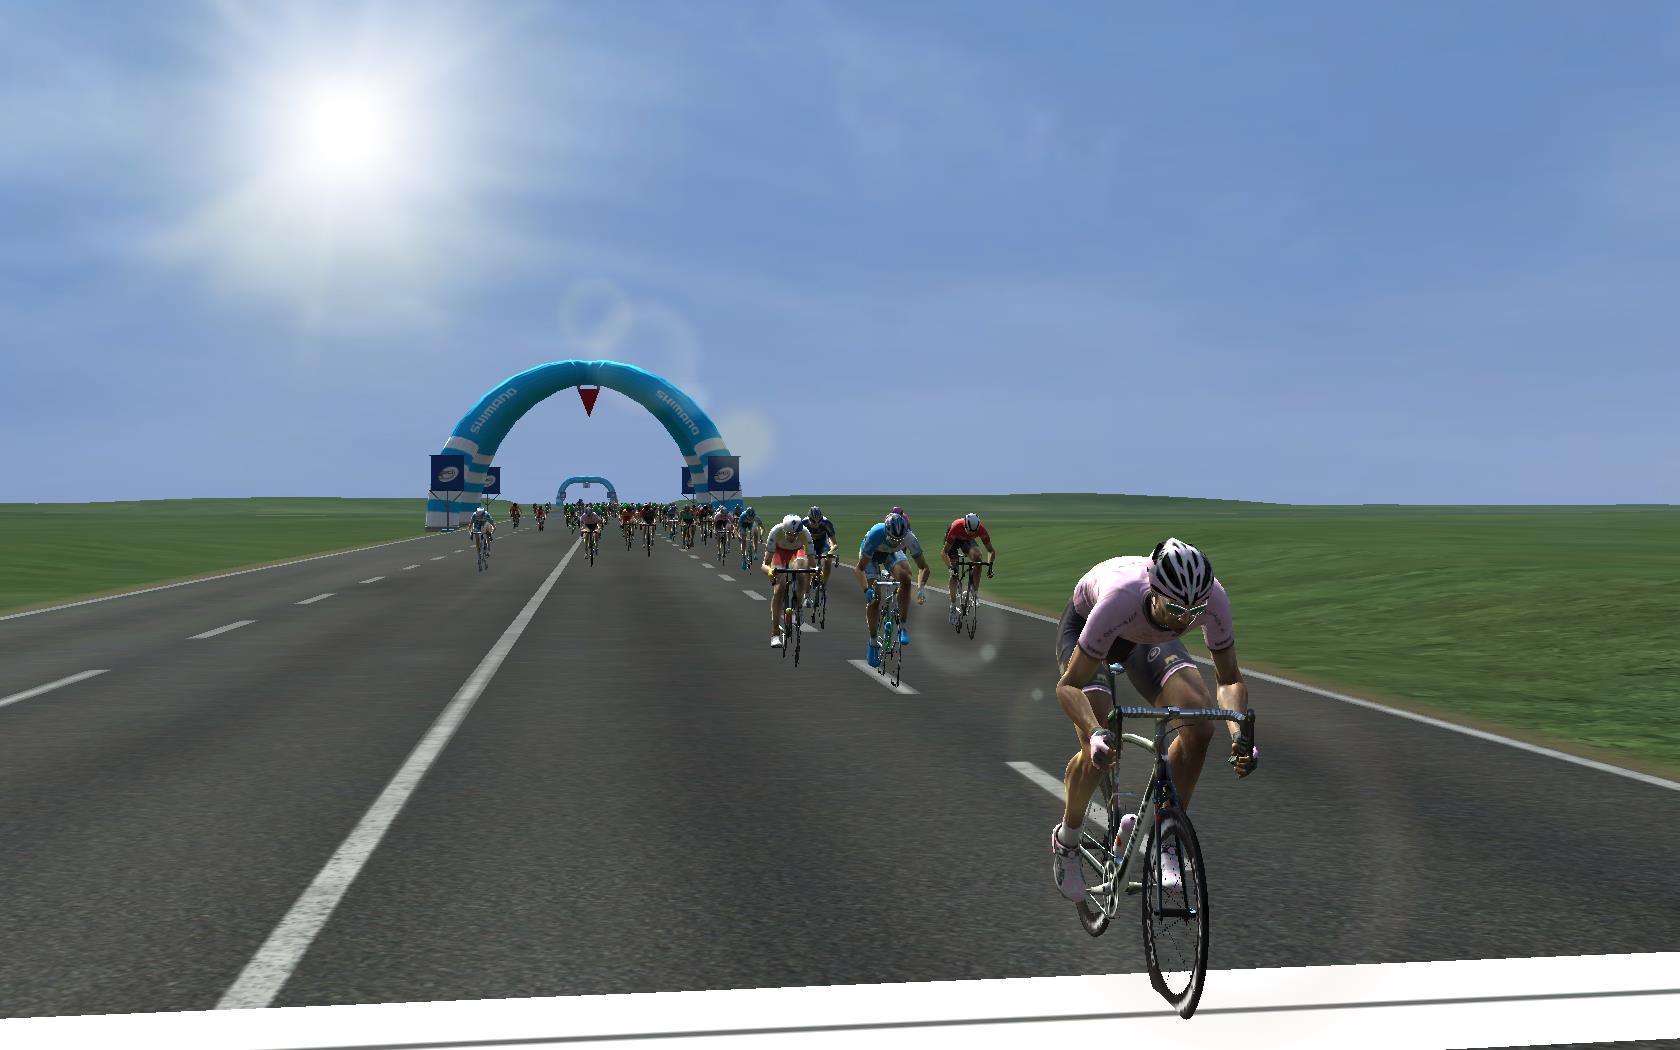 pcmdaily.com/images/mg/2018/Races/C2/USAPCC/1/PCM0015.jpg